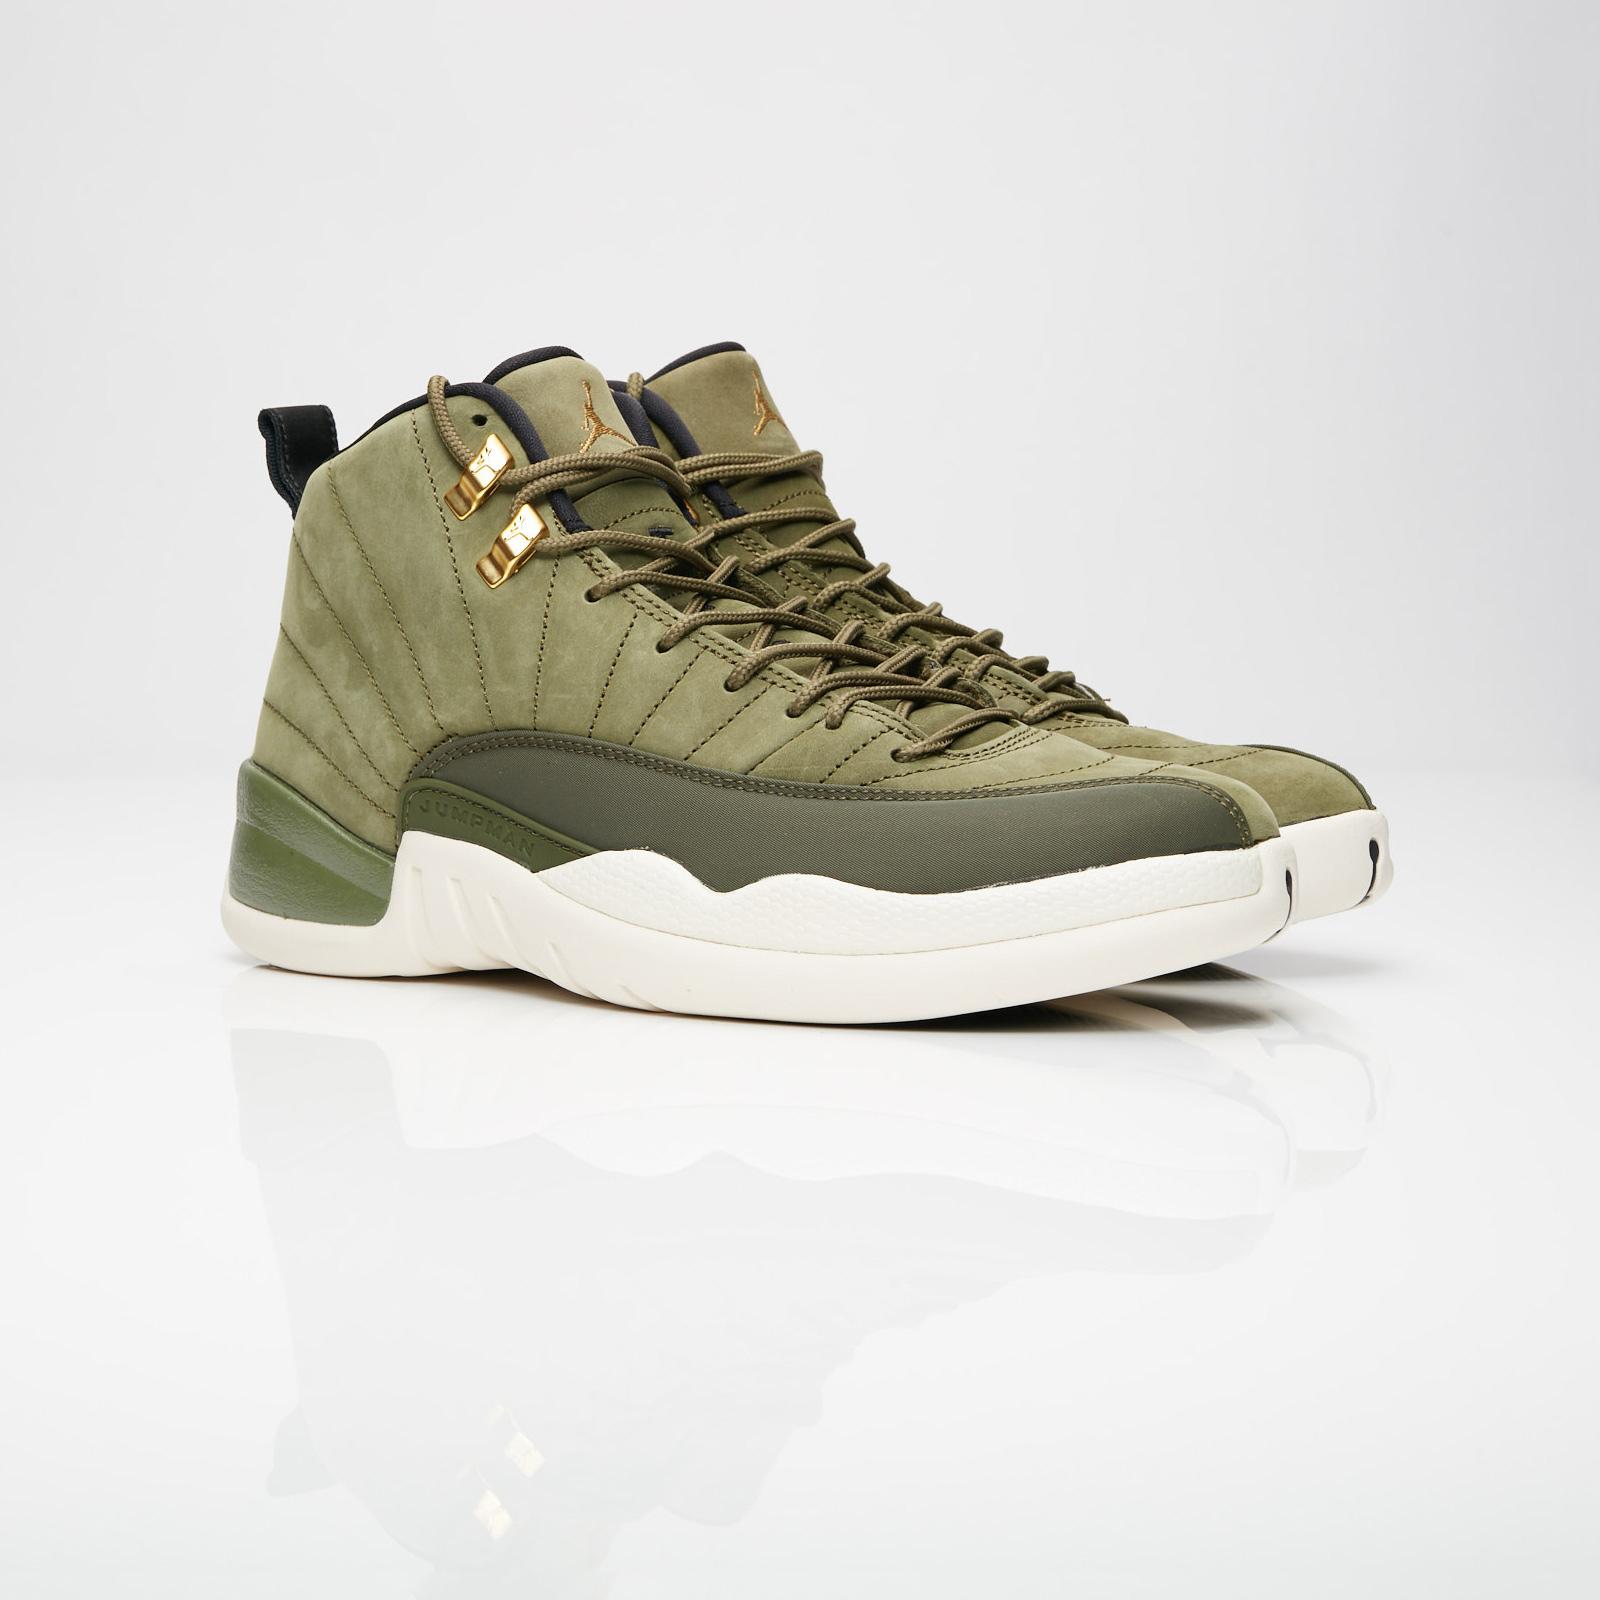 sale retailer f305b e666f Jordan Brand Air Jordan 12 Retro - 130690-301 ...